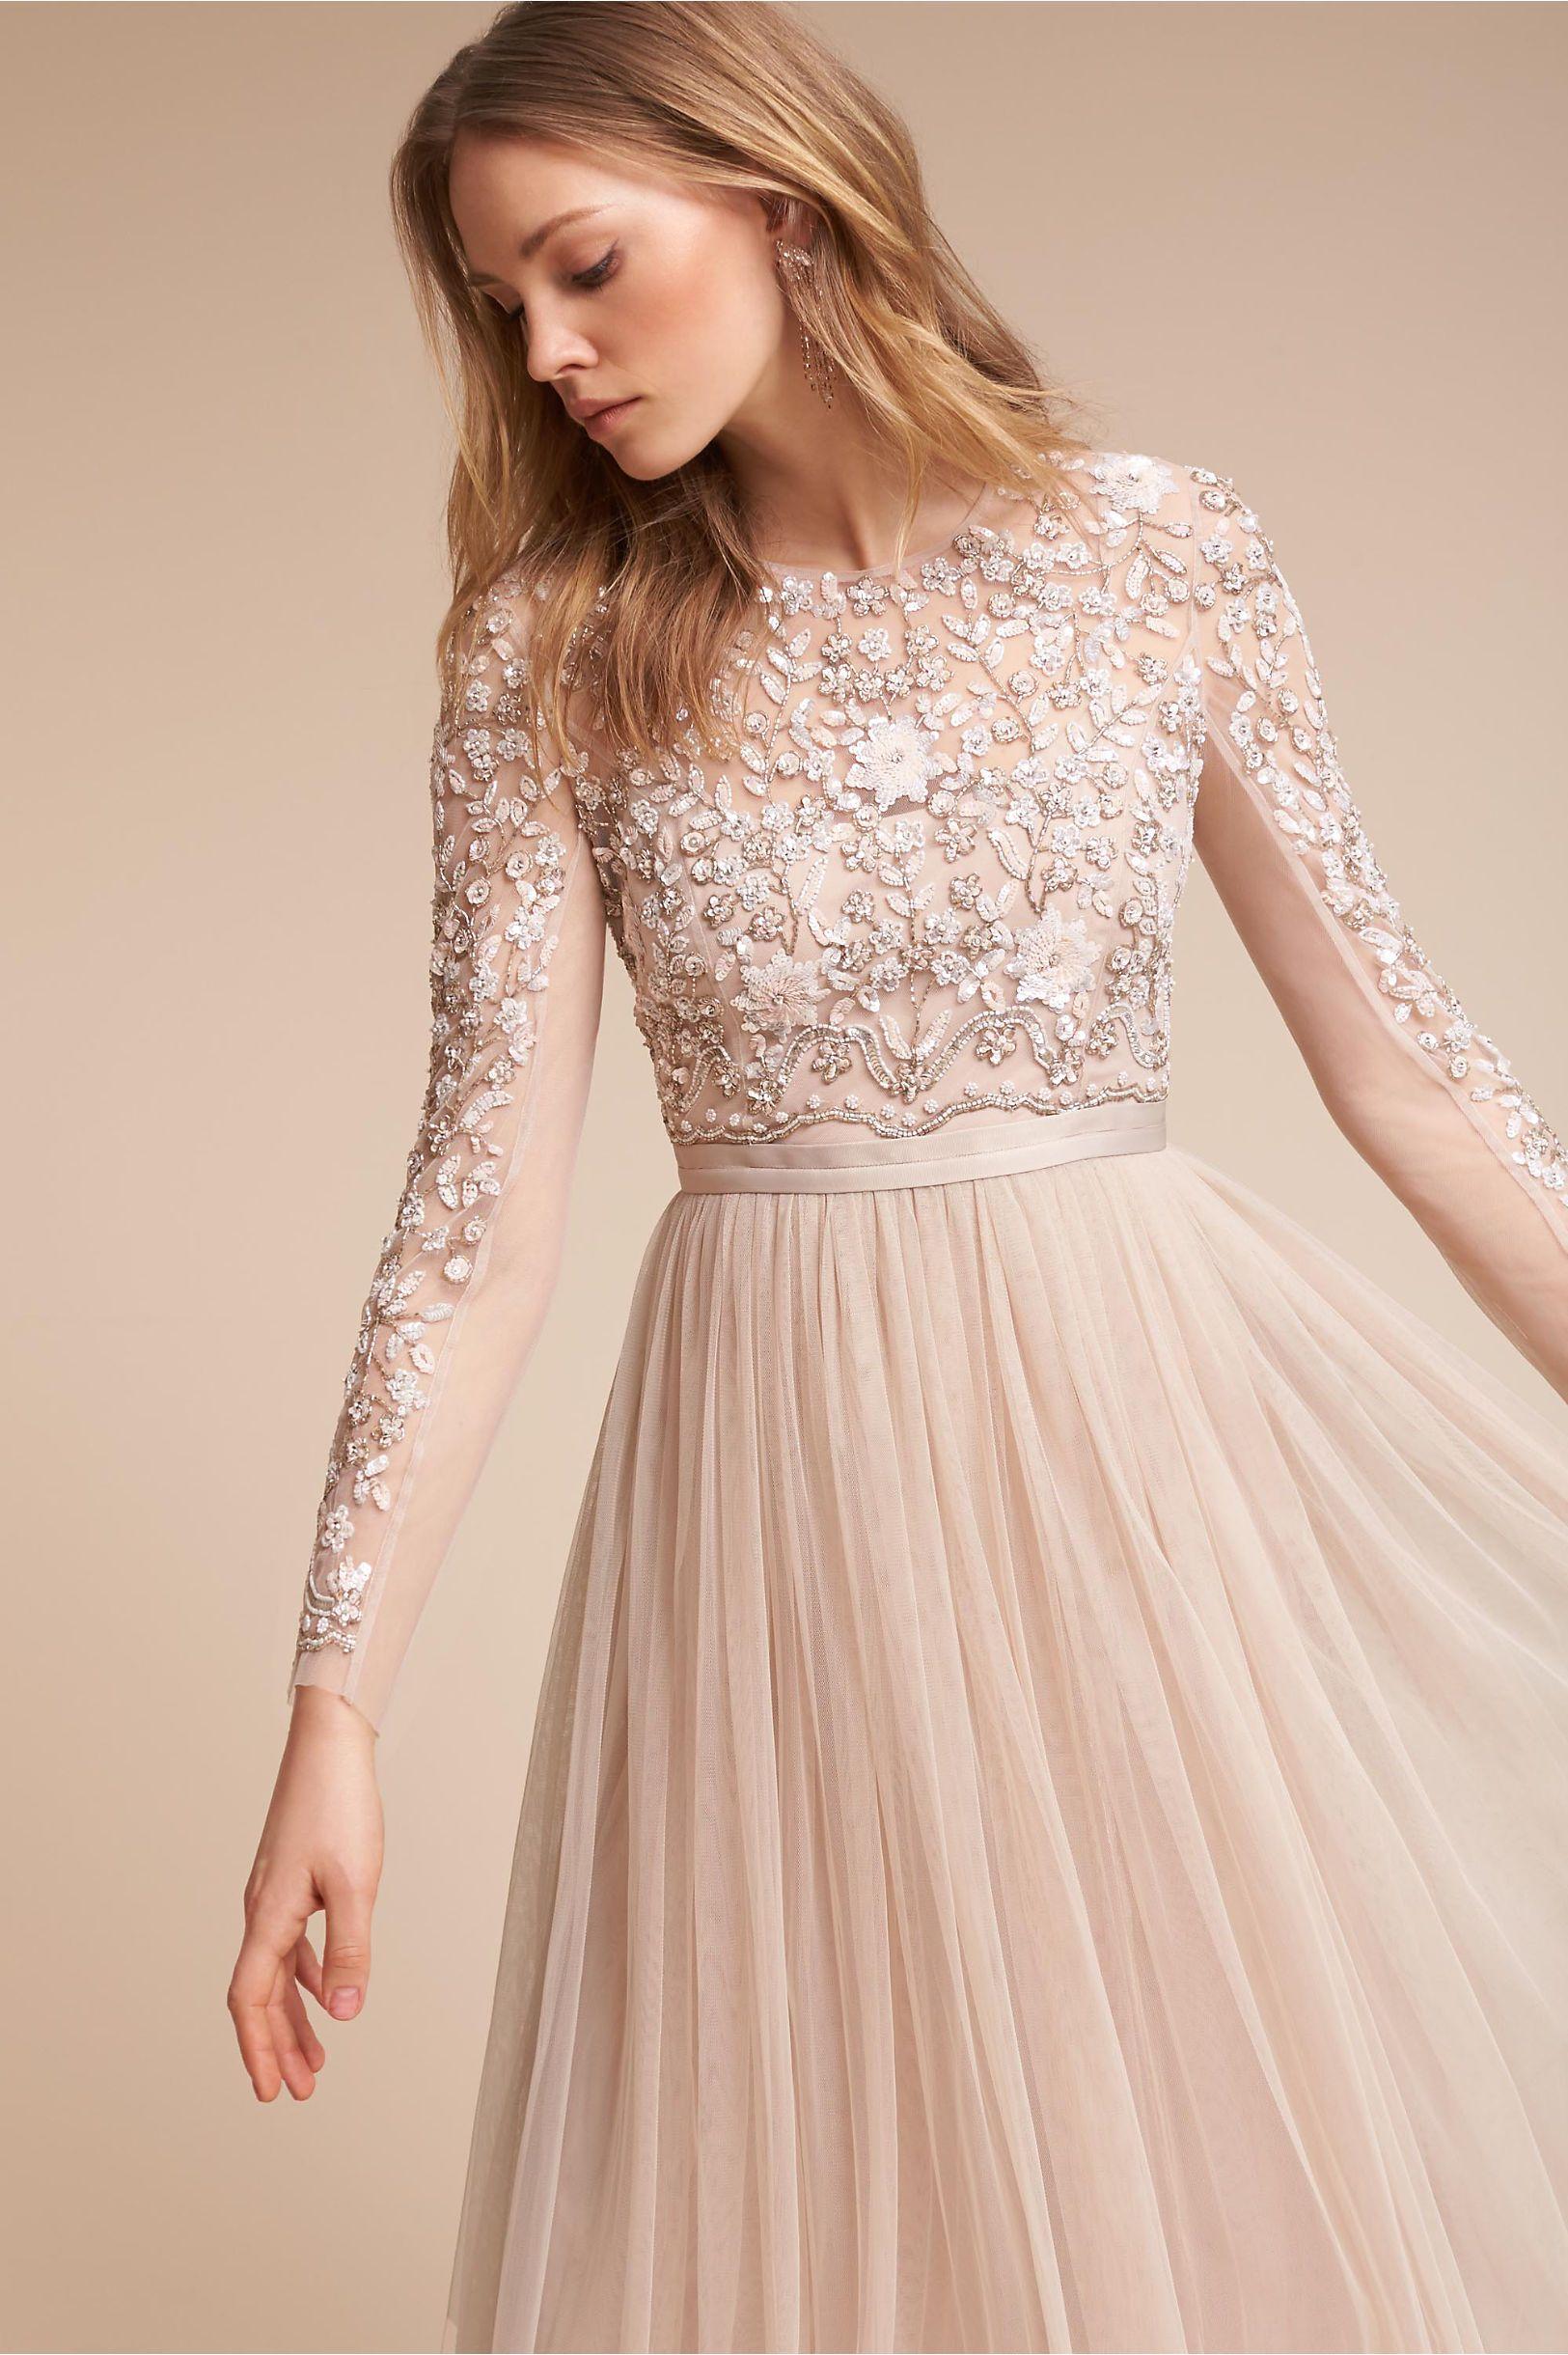 Bhldn rhapsody dress in bride wedding dresses gowns under